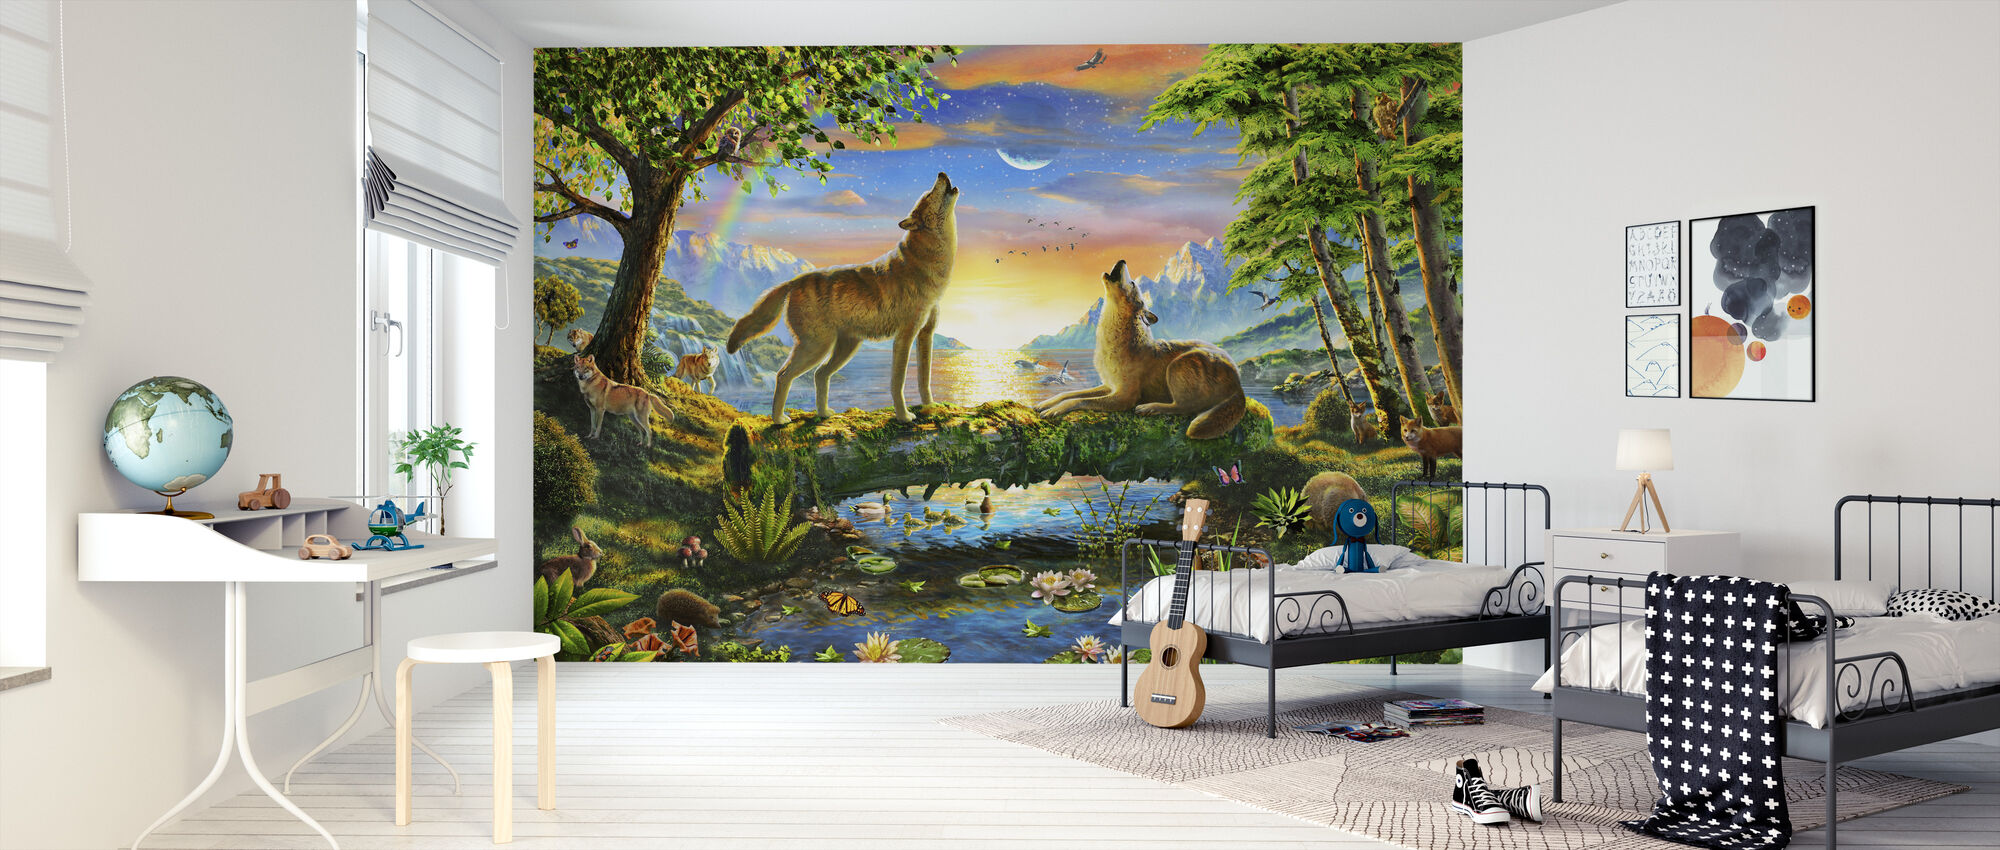 Wolf Harmony - Wallpaper - Kids Room